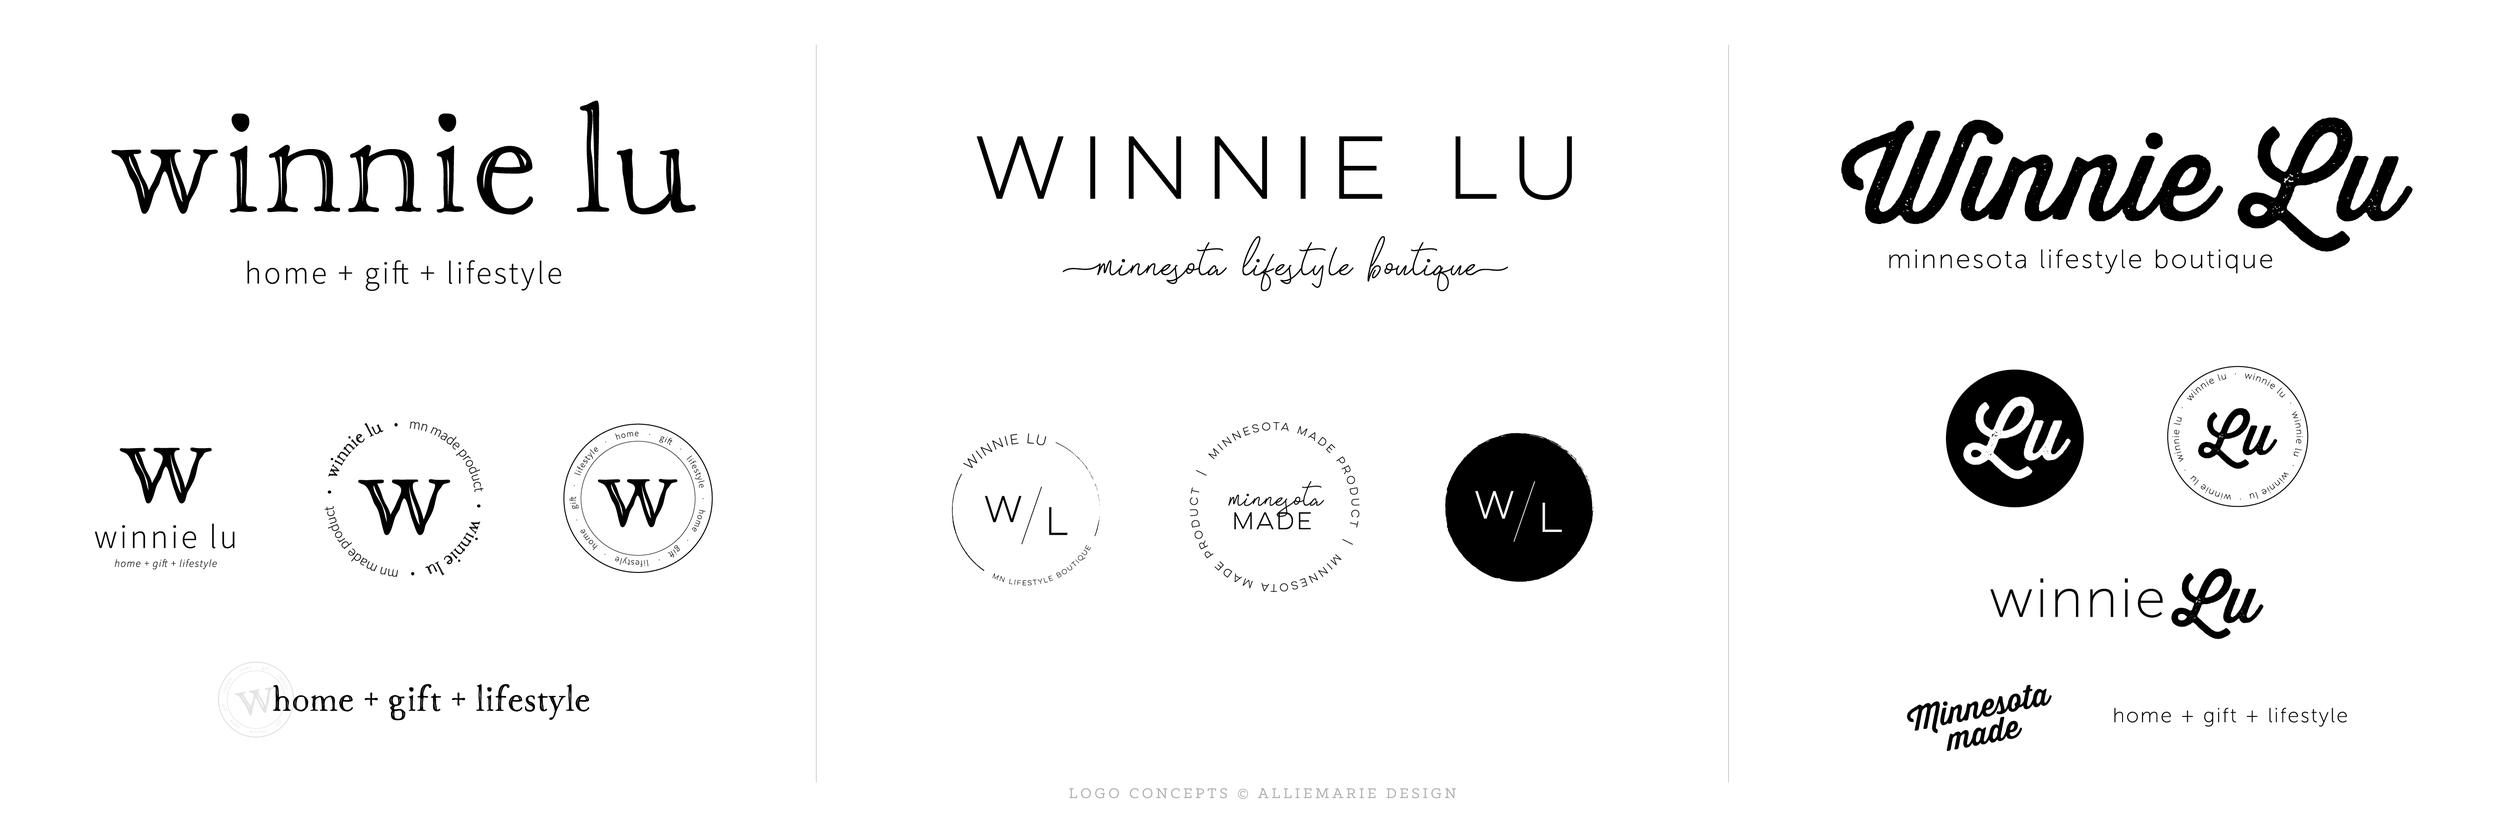 Winnie Lu Minnesota Boutique Logo Concepts by AllieMarie Design